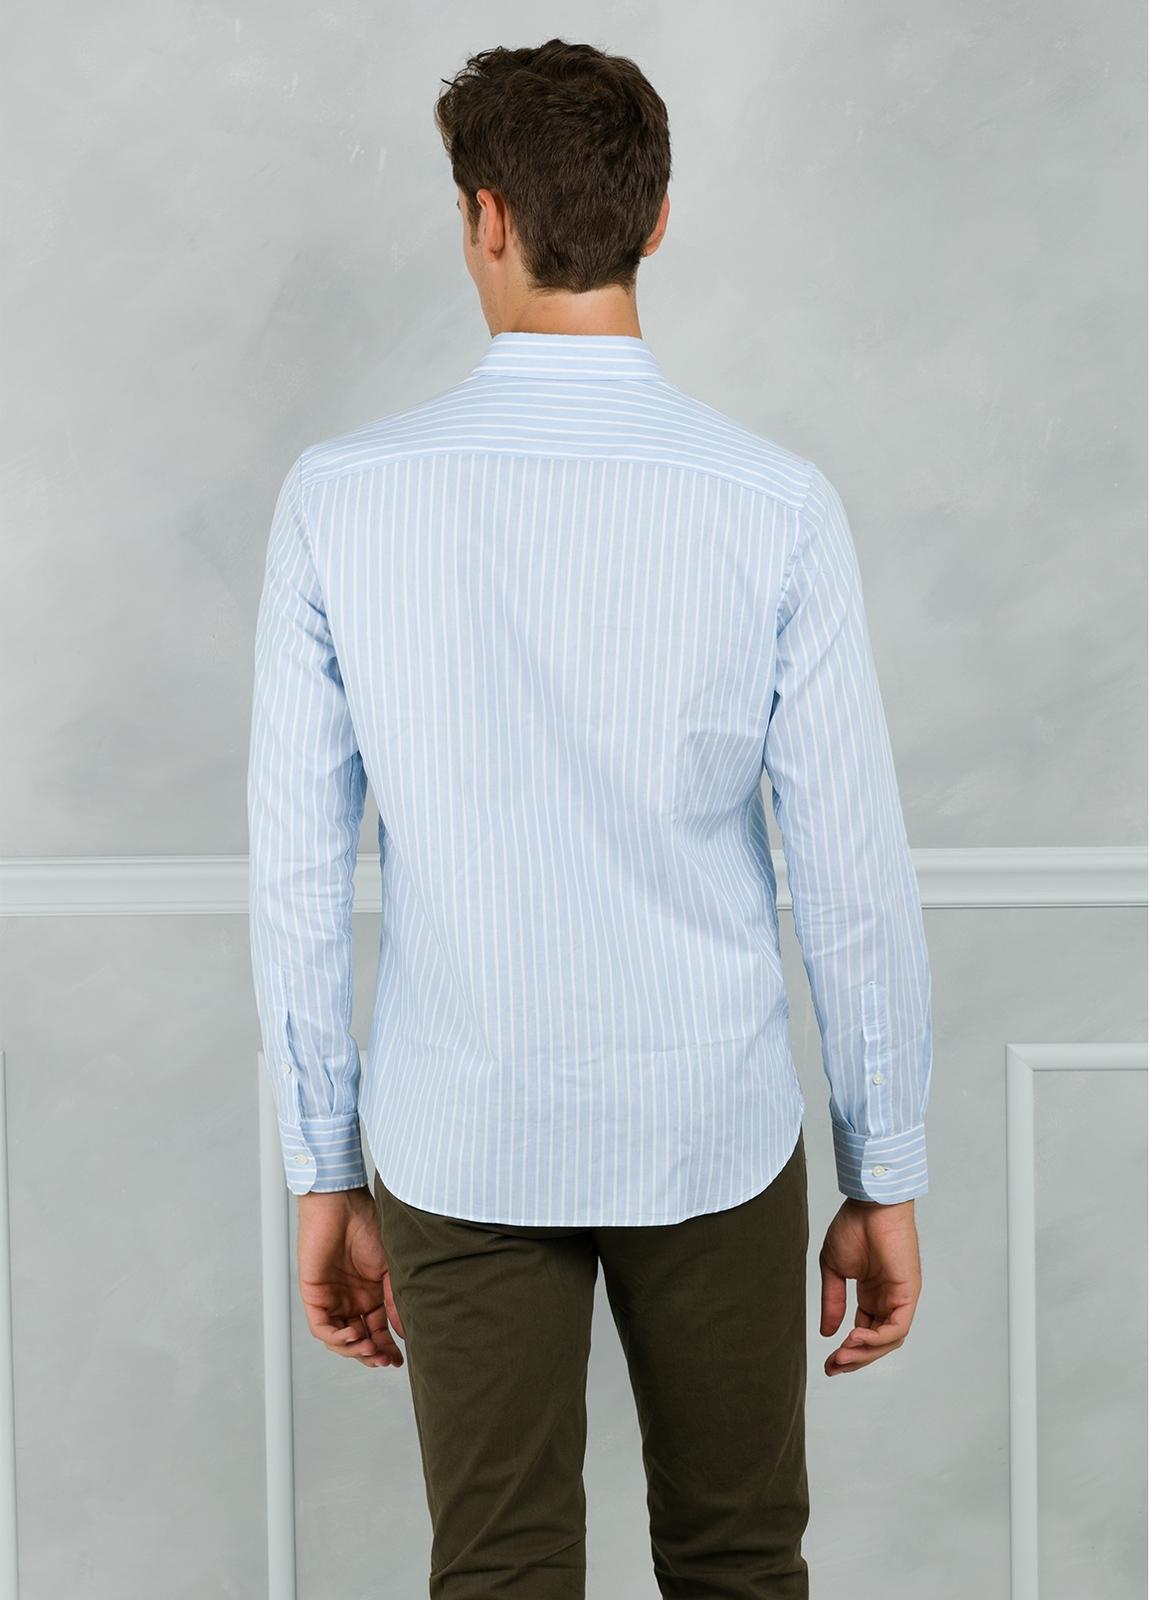 Camisa Leisure Wear REGULAR FIT Modelo BOTTON DOWN de rayas, color celeste. 100% Algodón. - Ítem1